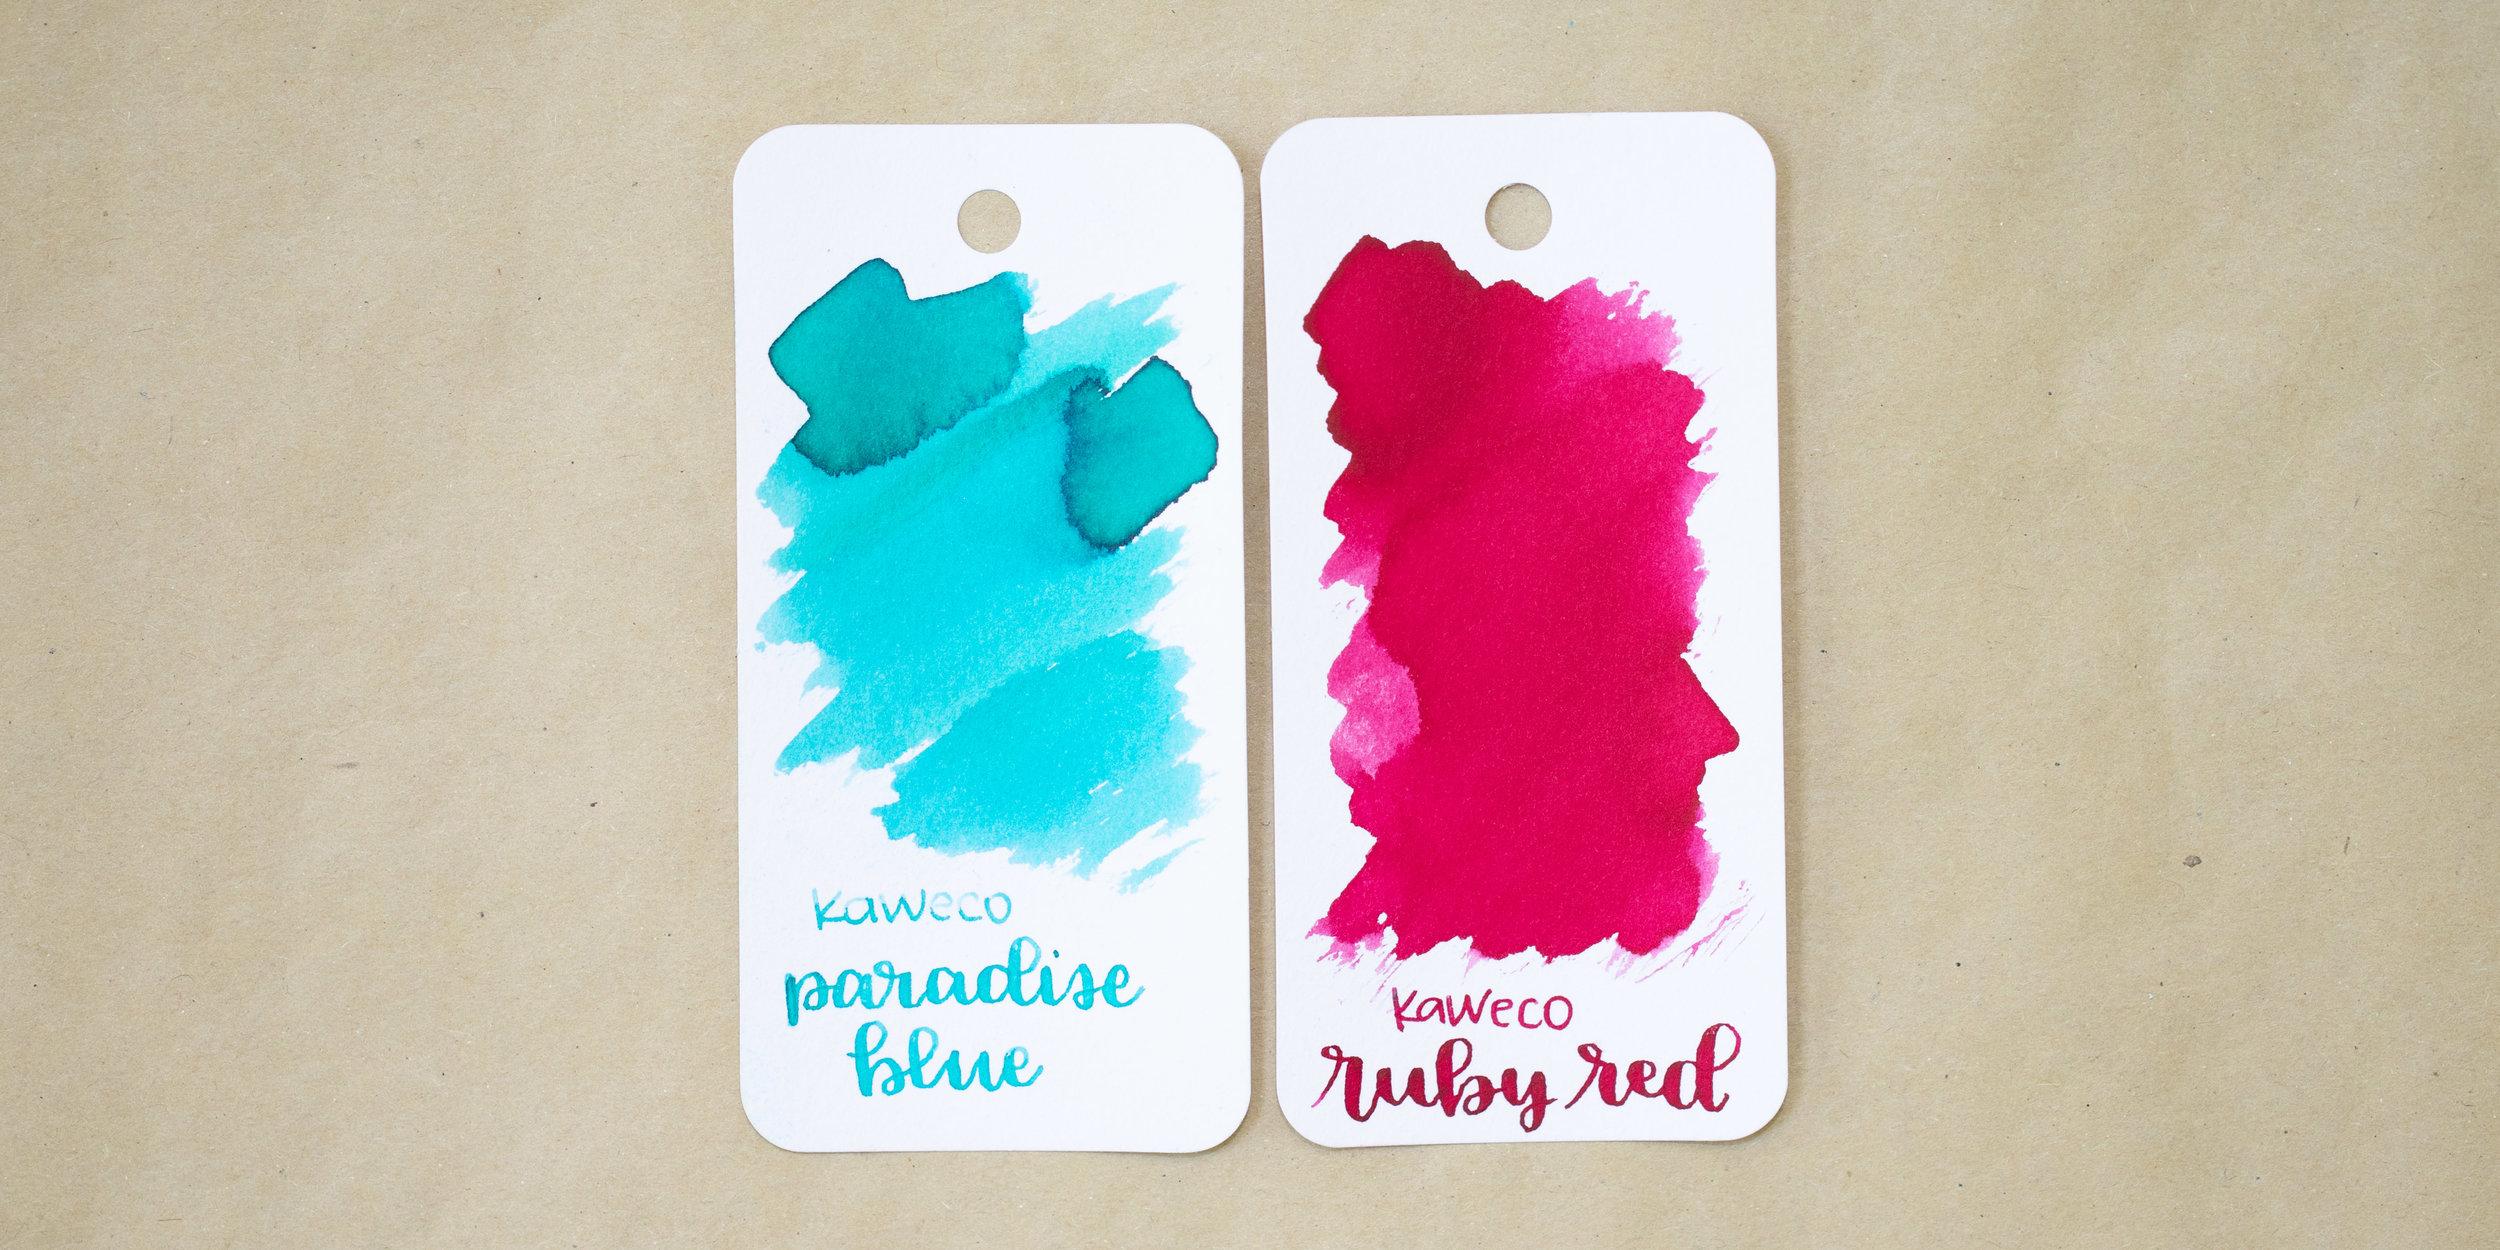 ink-brands-1-5.jpg